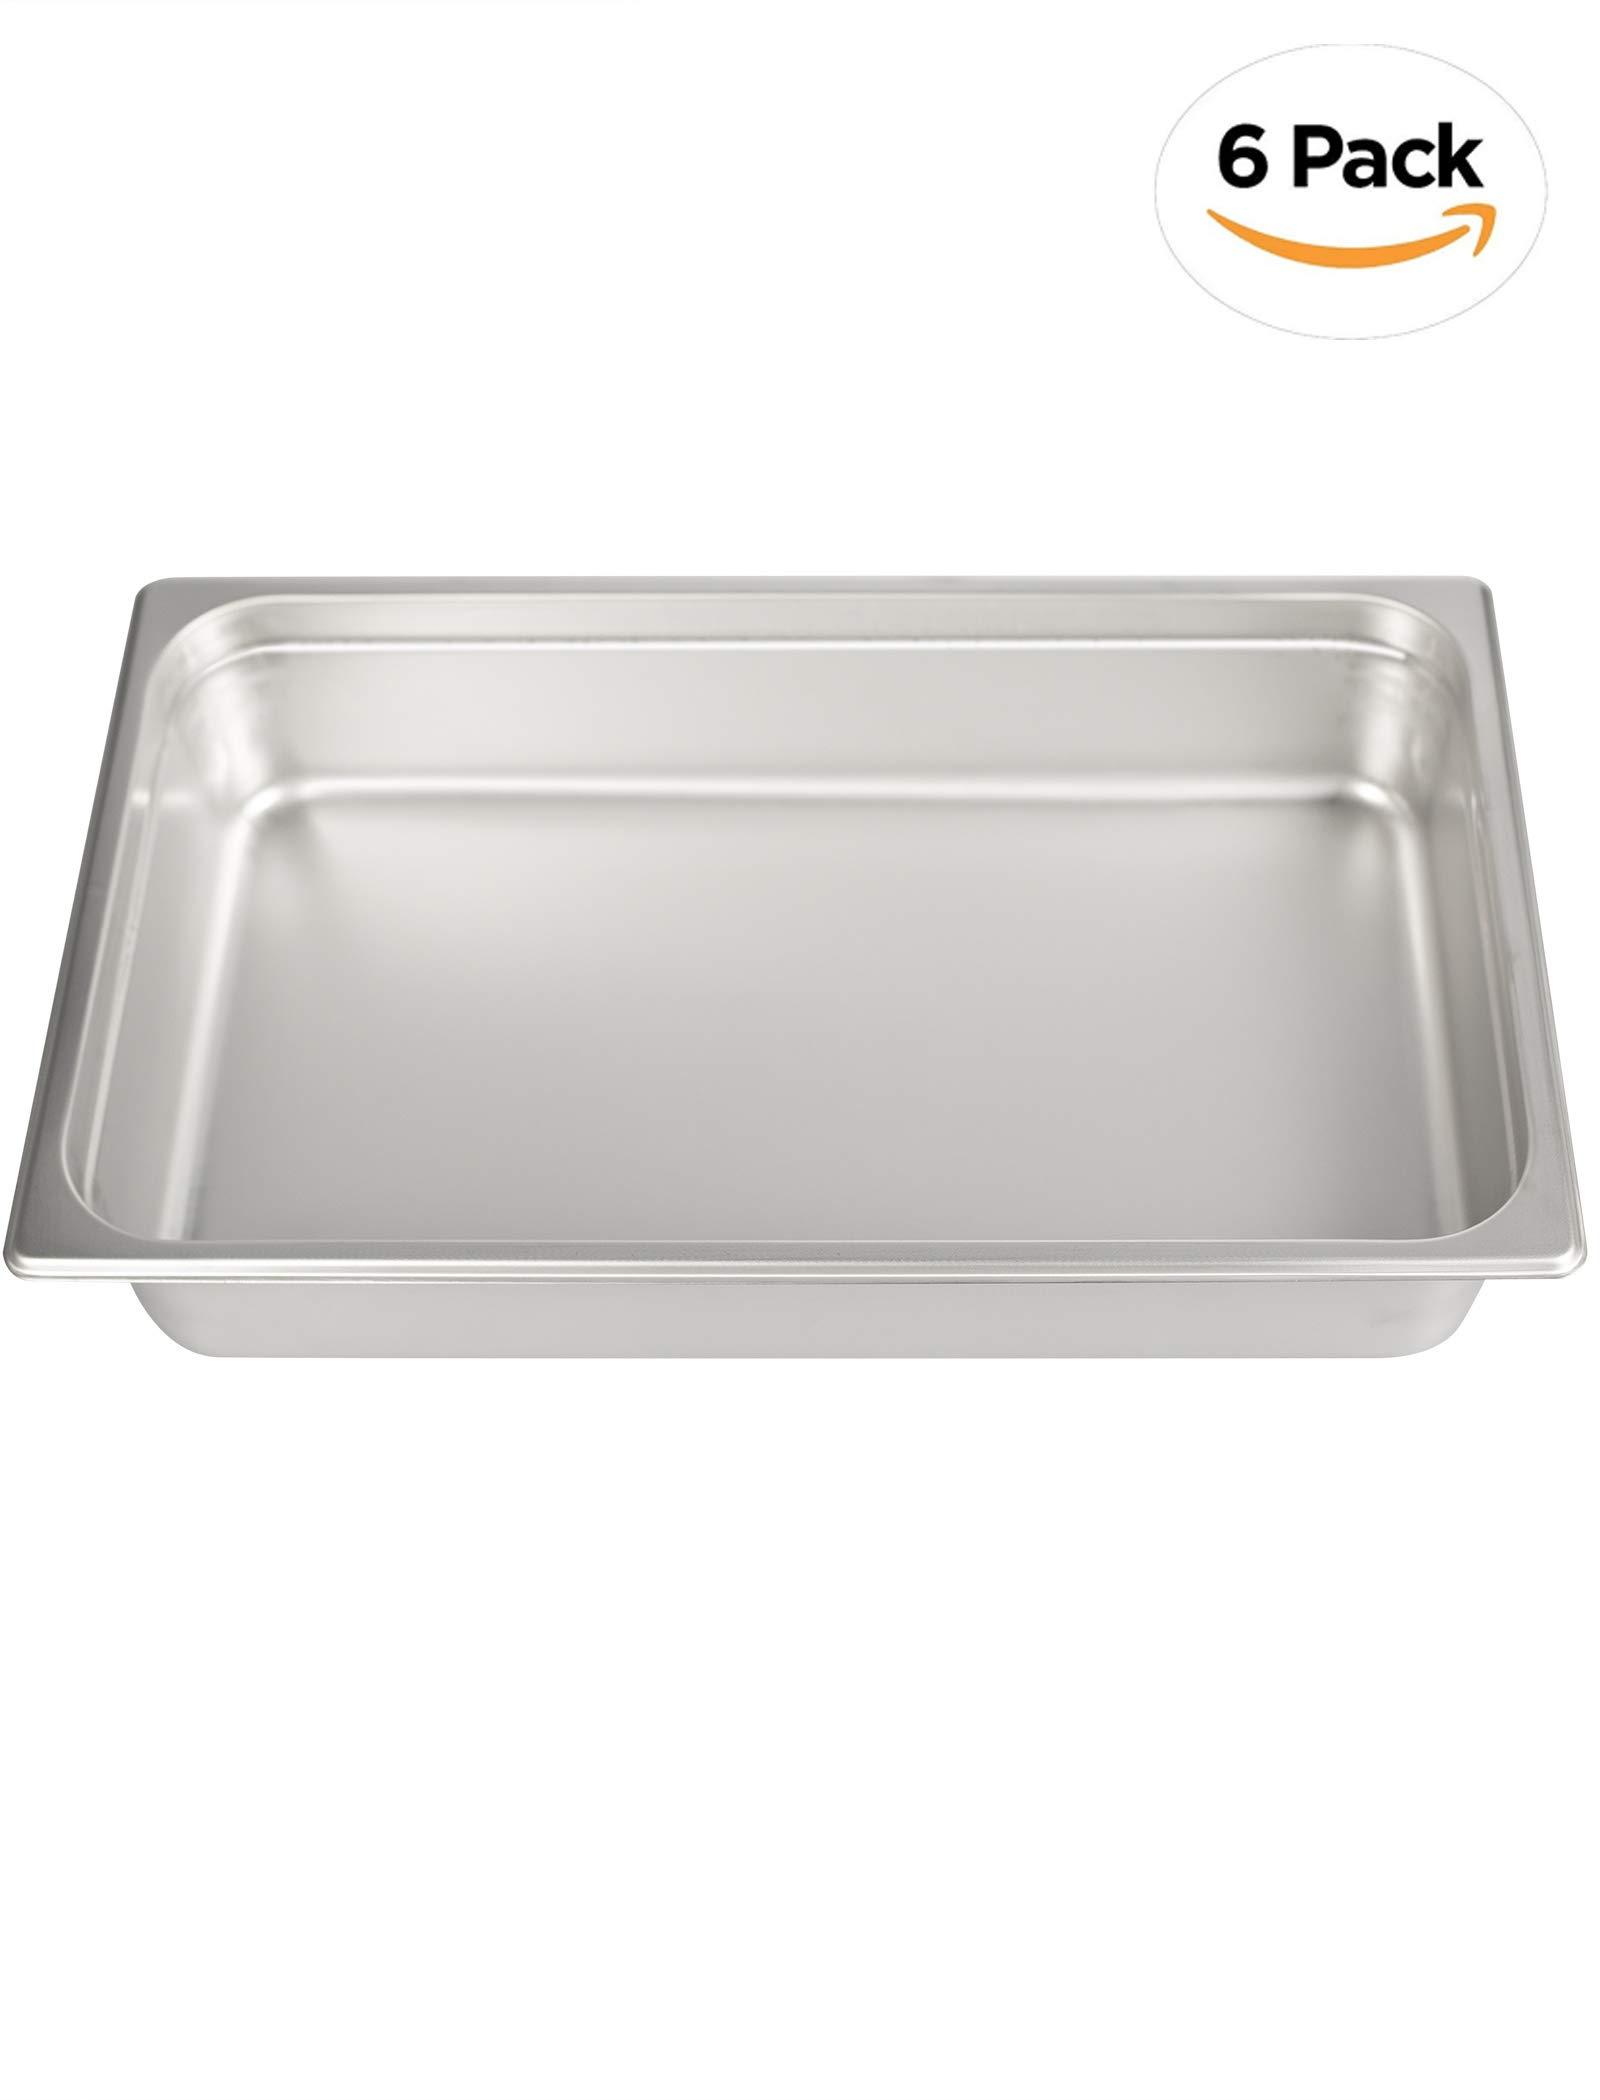 Stainless Steel Steam Table Pan Full Size,ATOSA A2004 Stainless Steel Steam Table Pan 4'' Deep and 6 Pieces Per Carton Pan Buffet Food Pans Food Pan Pack of 6